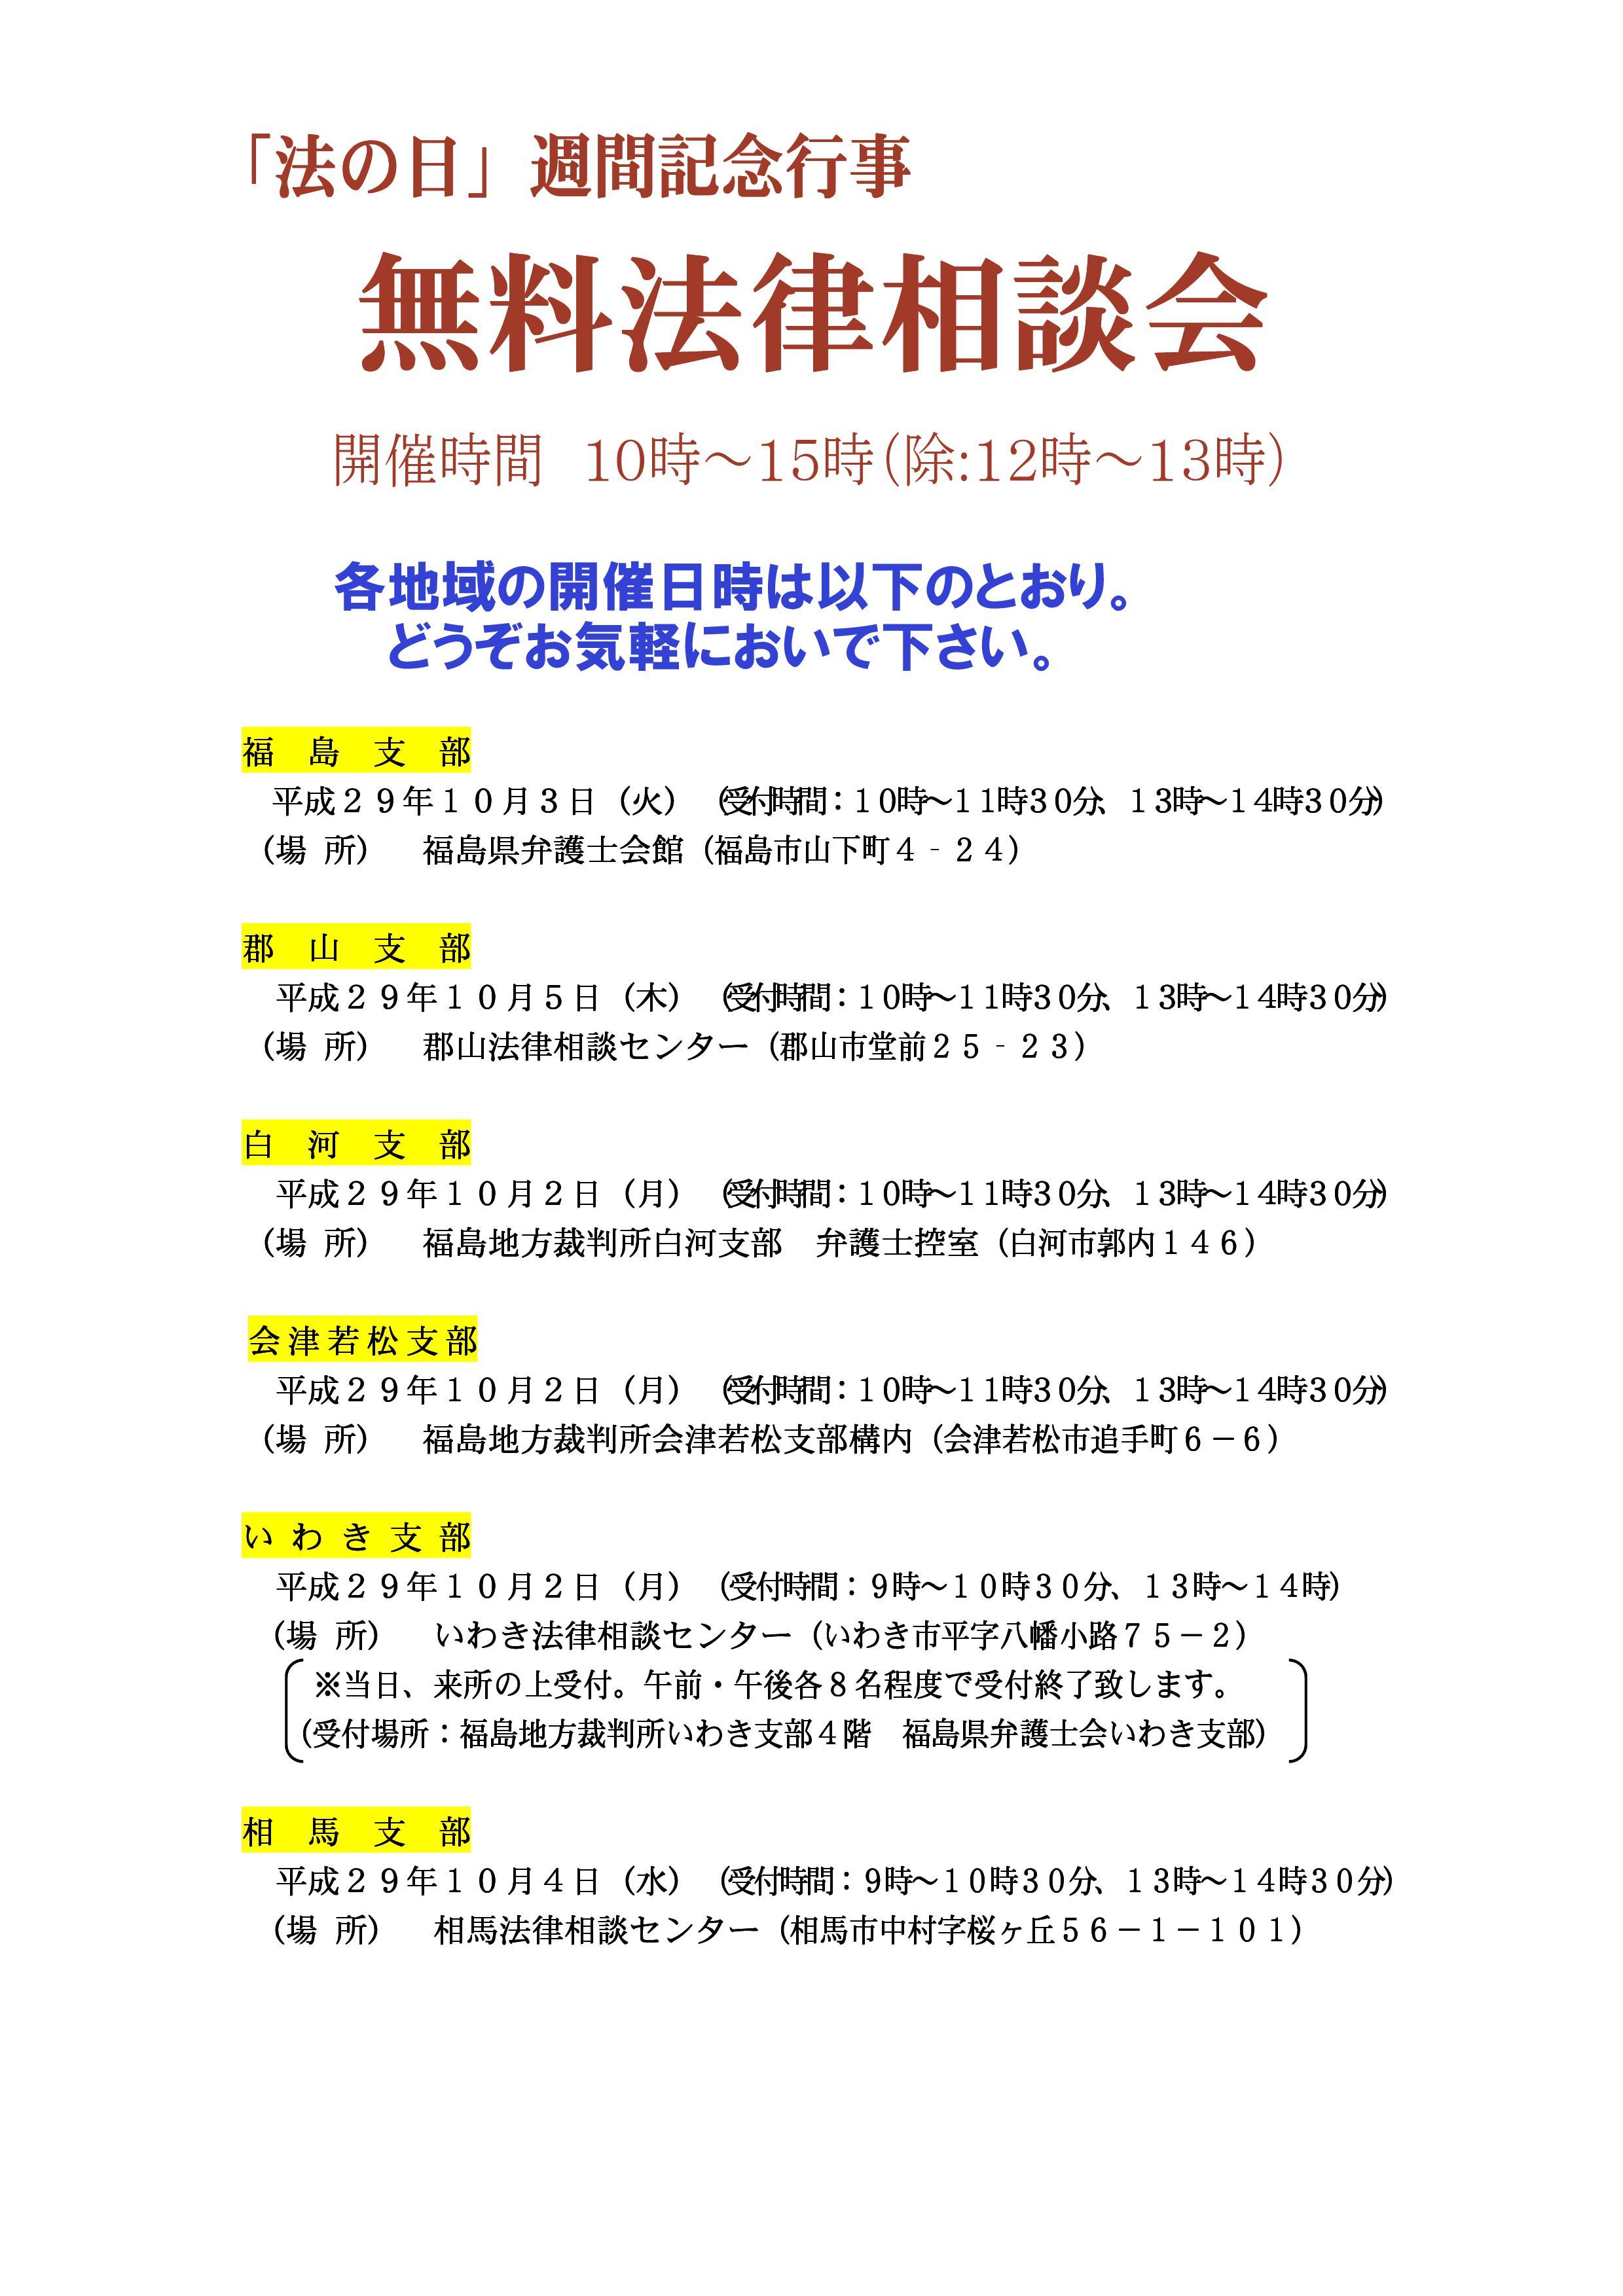 Microsoft Word - 平成29年度法の日記念 HPチラシ(2)